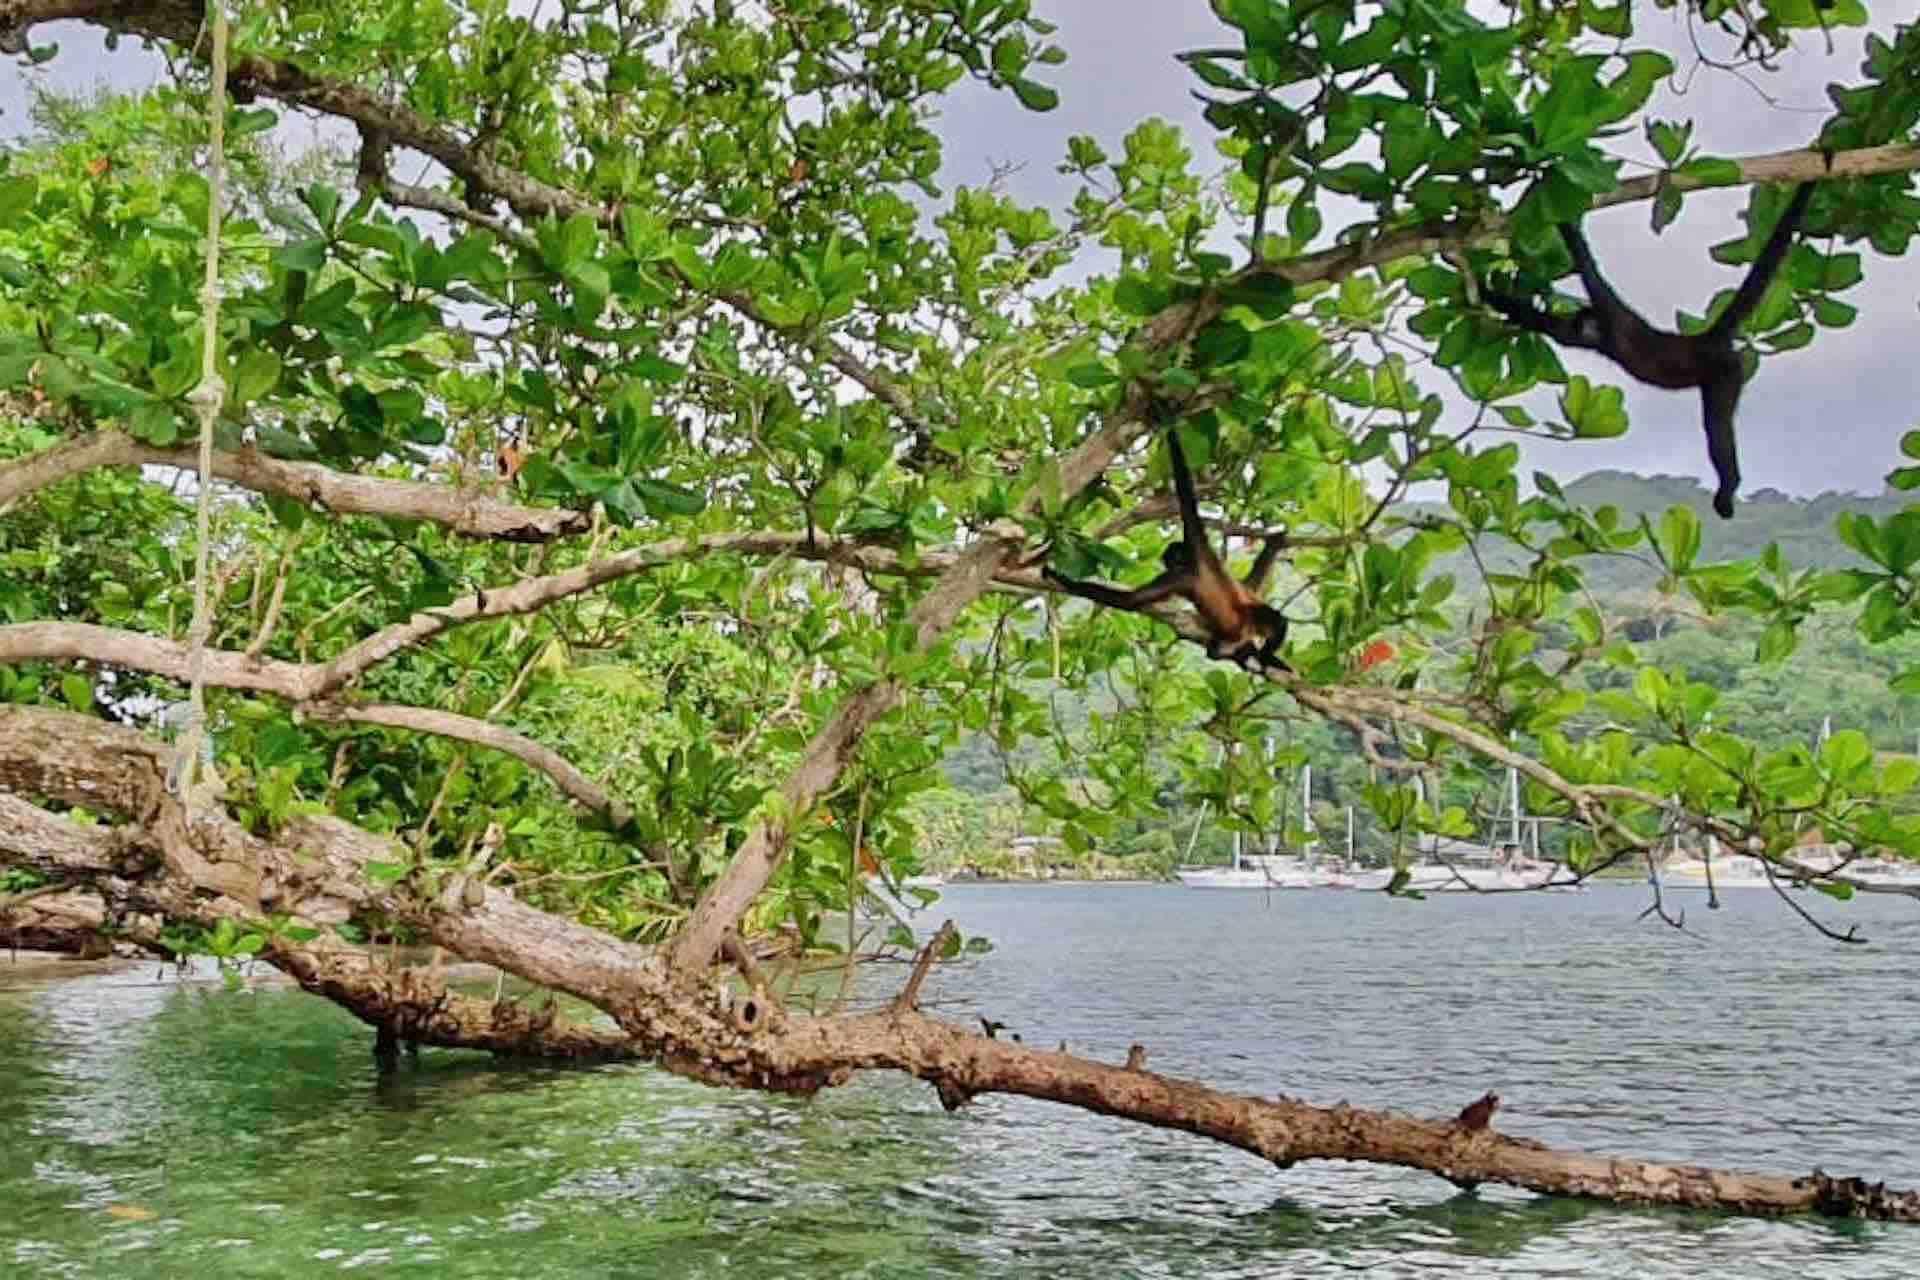 Panama Caribbean tour monkey on tree